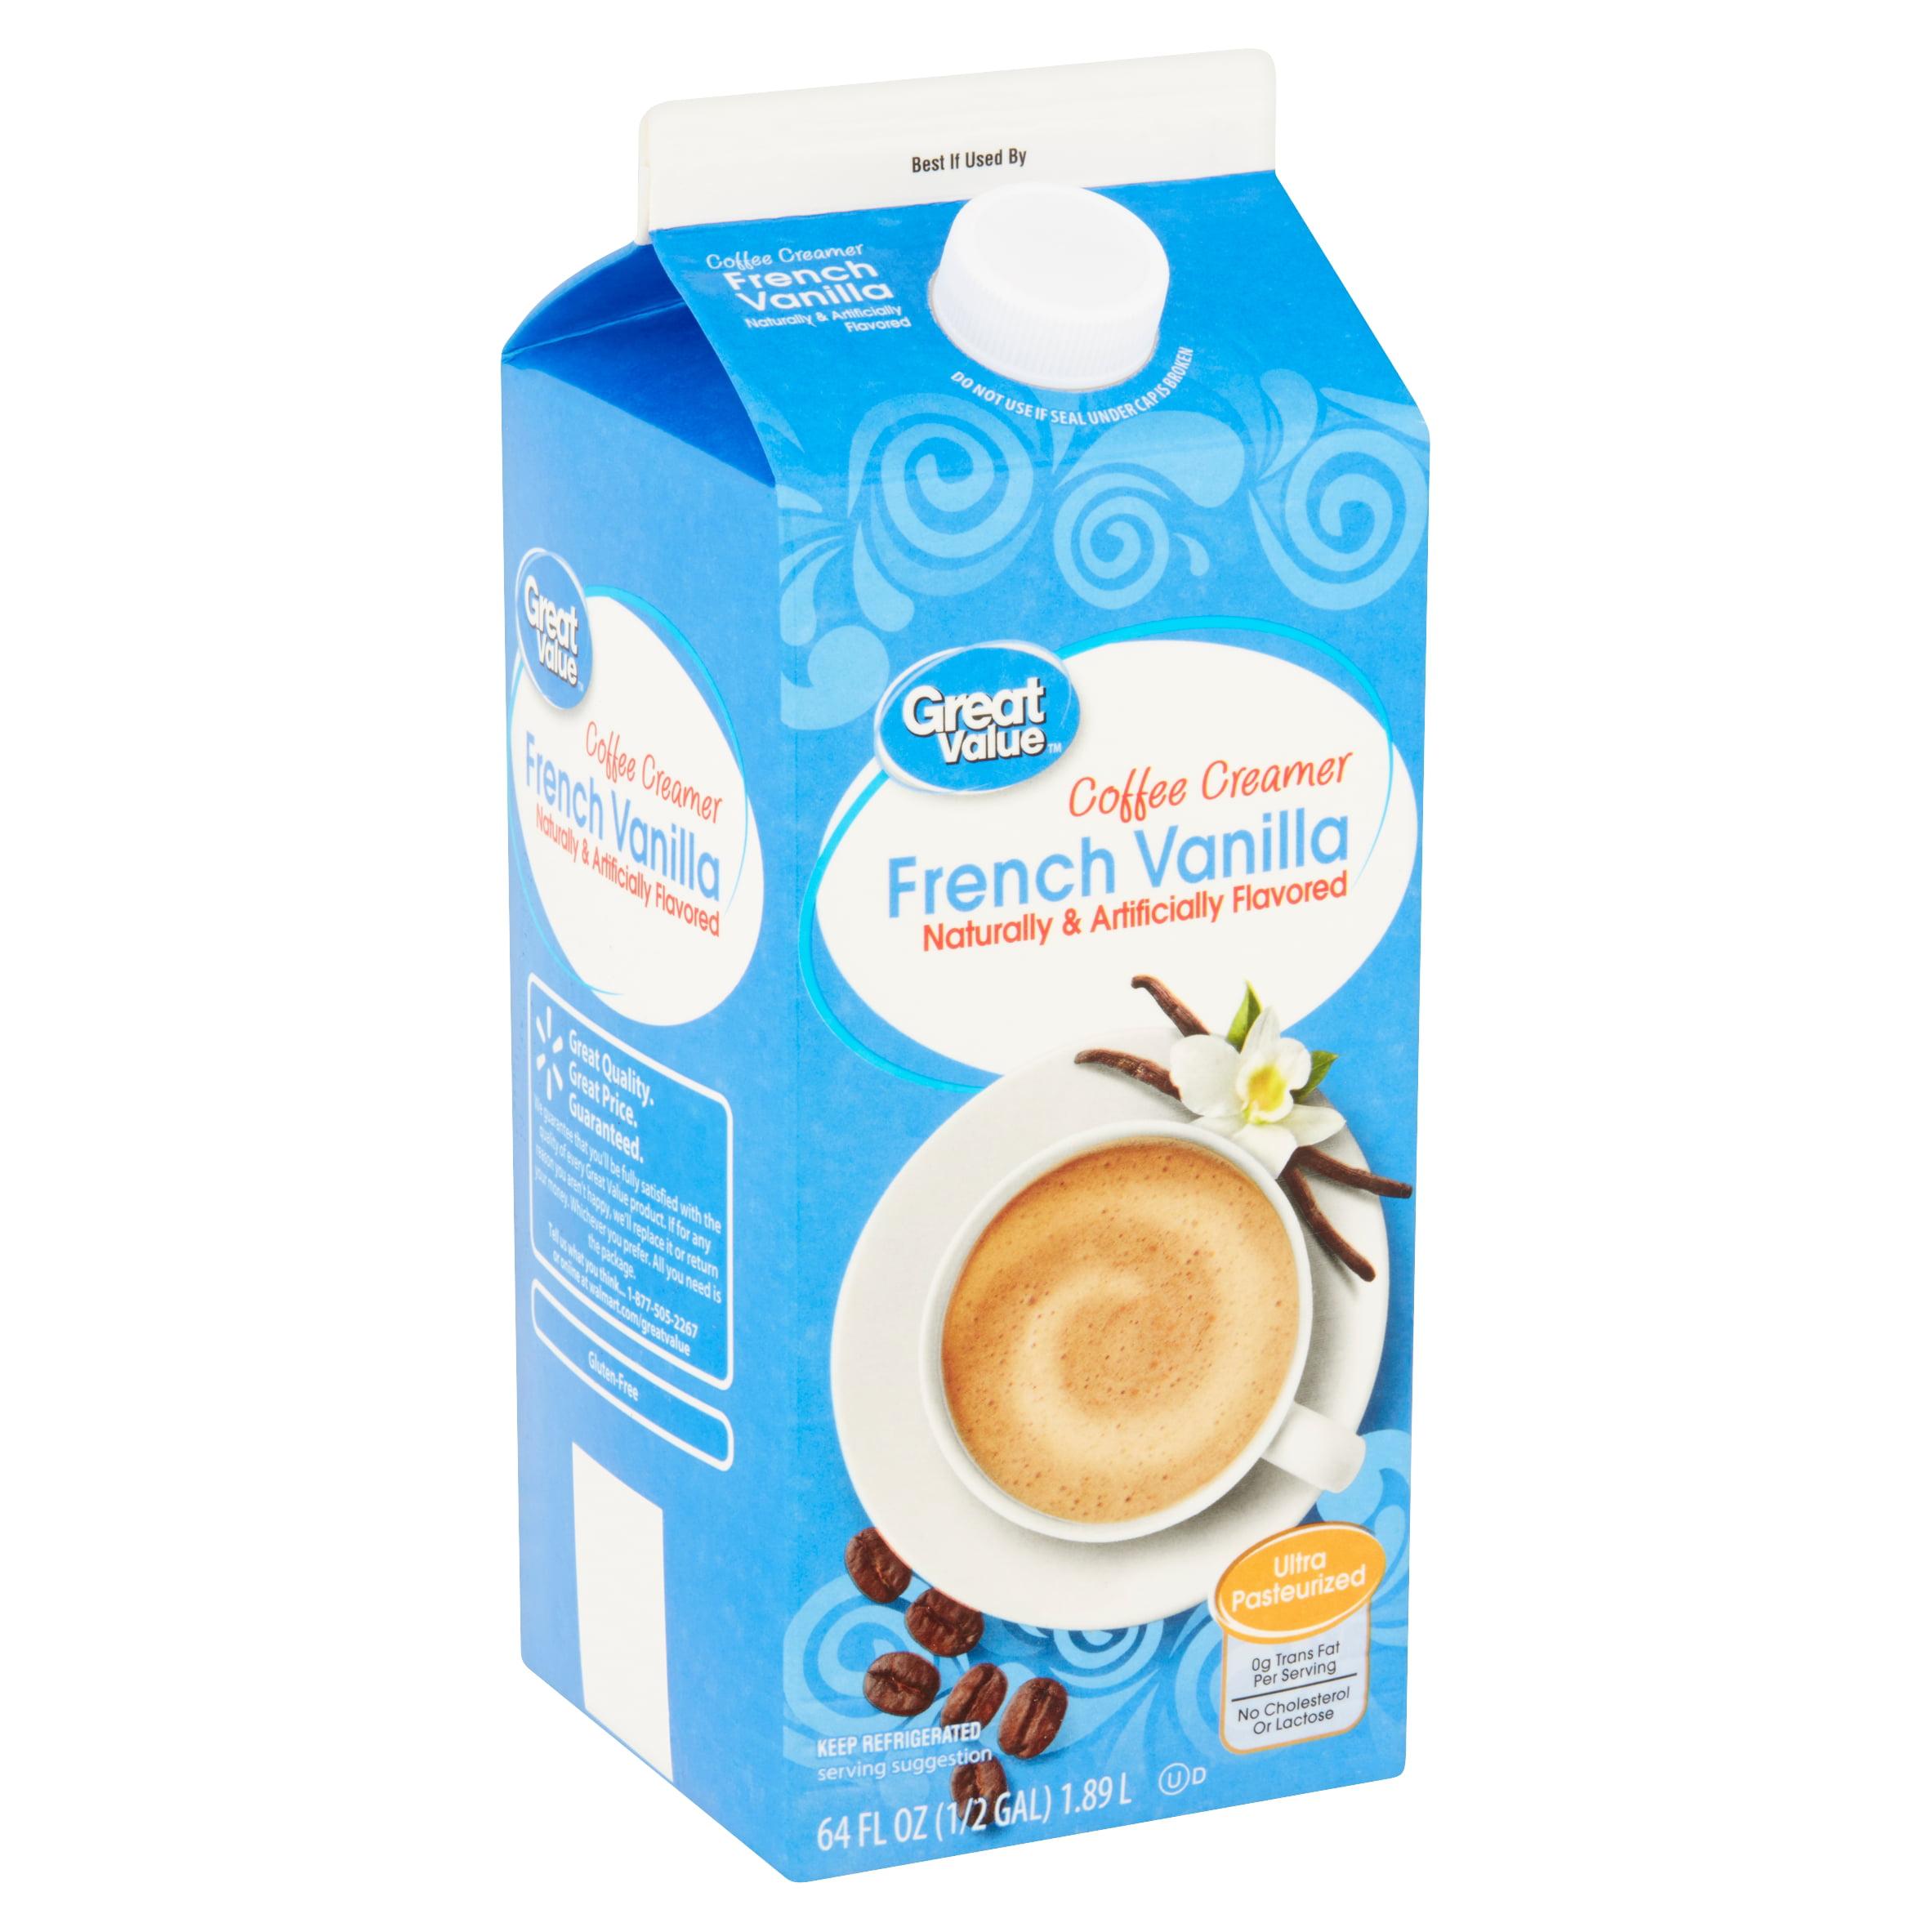 Great Value French Vanilla Coffee Creamer, 64 fl oz